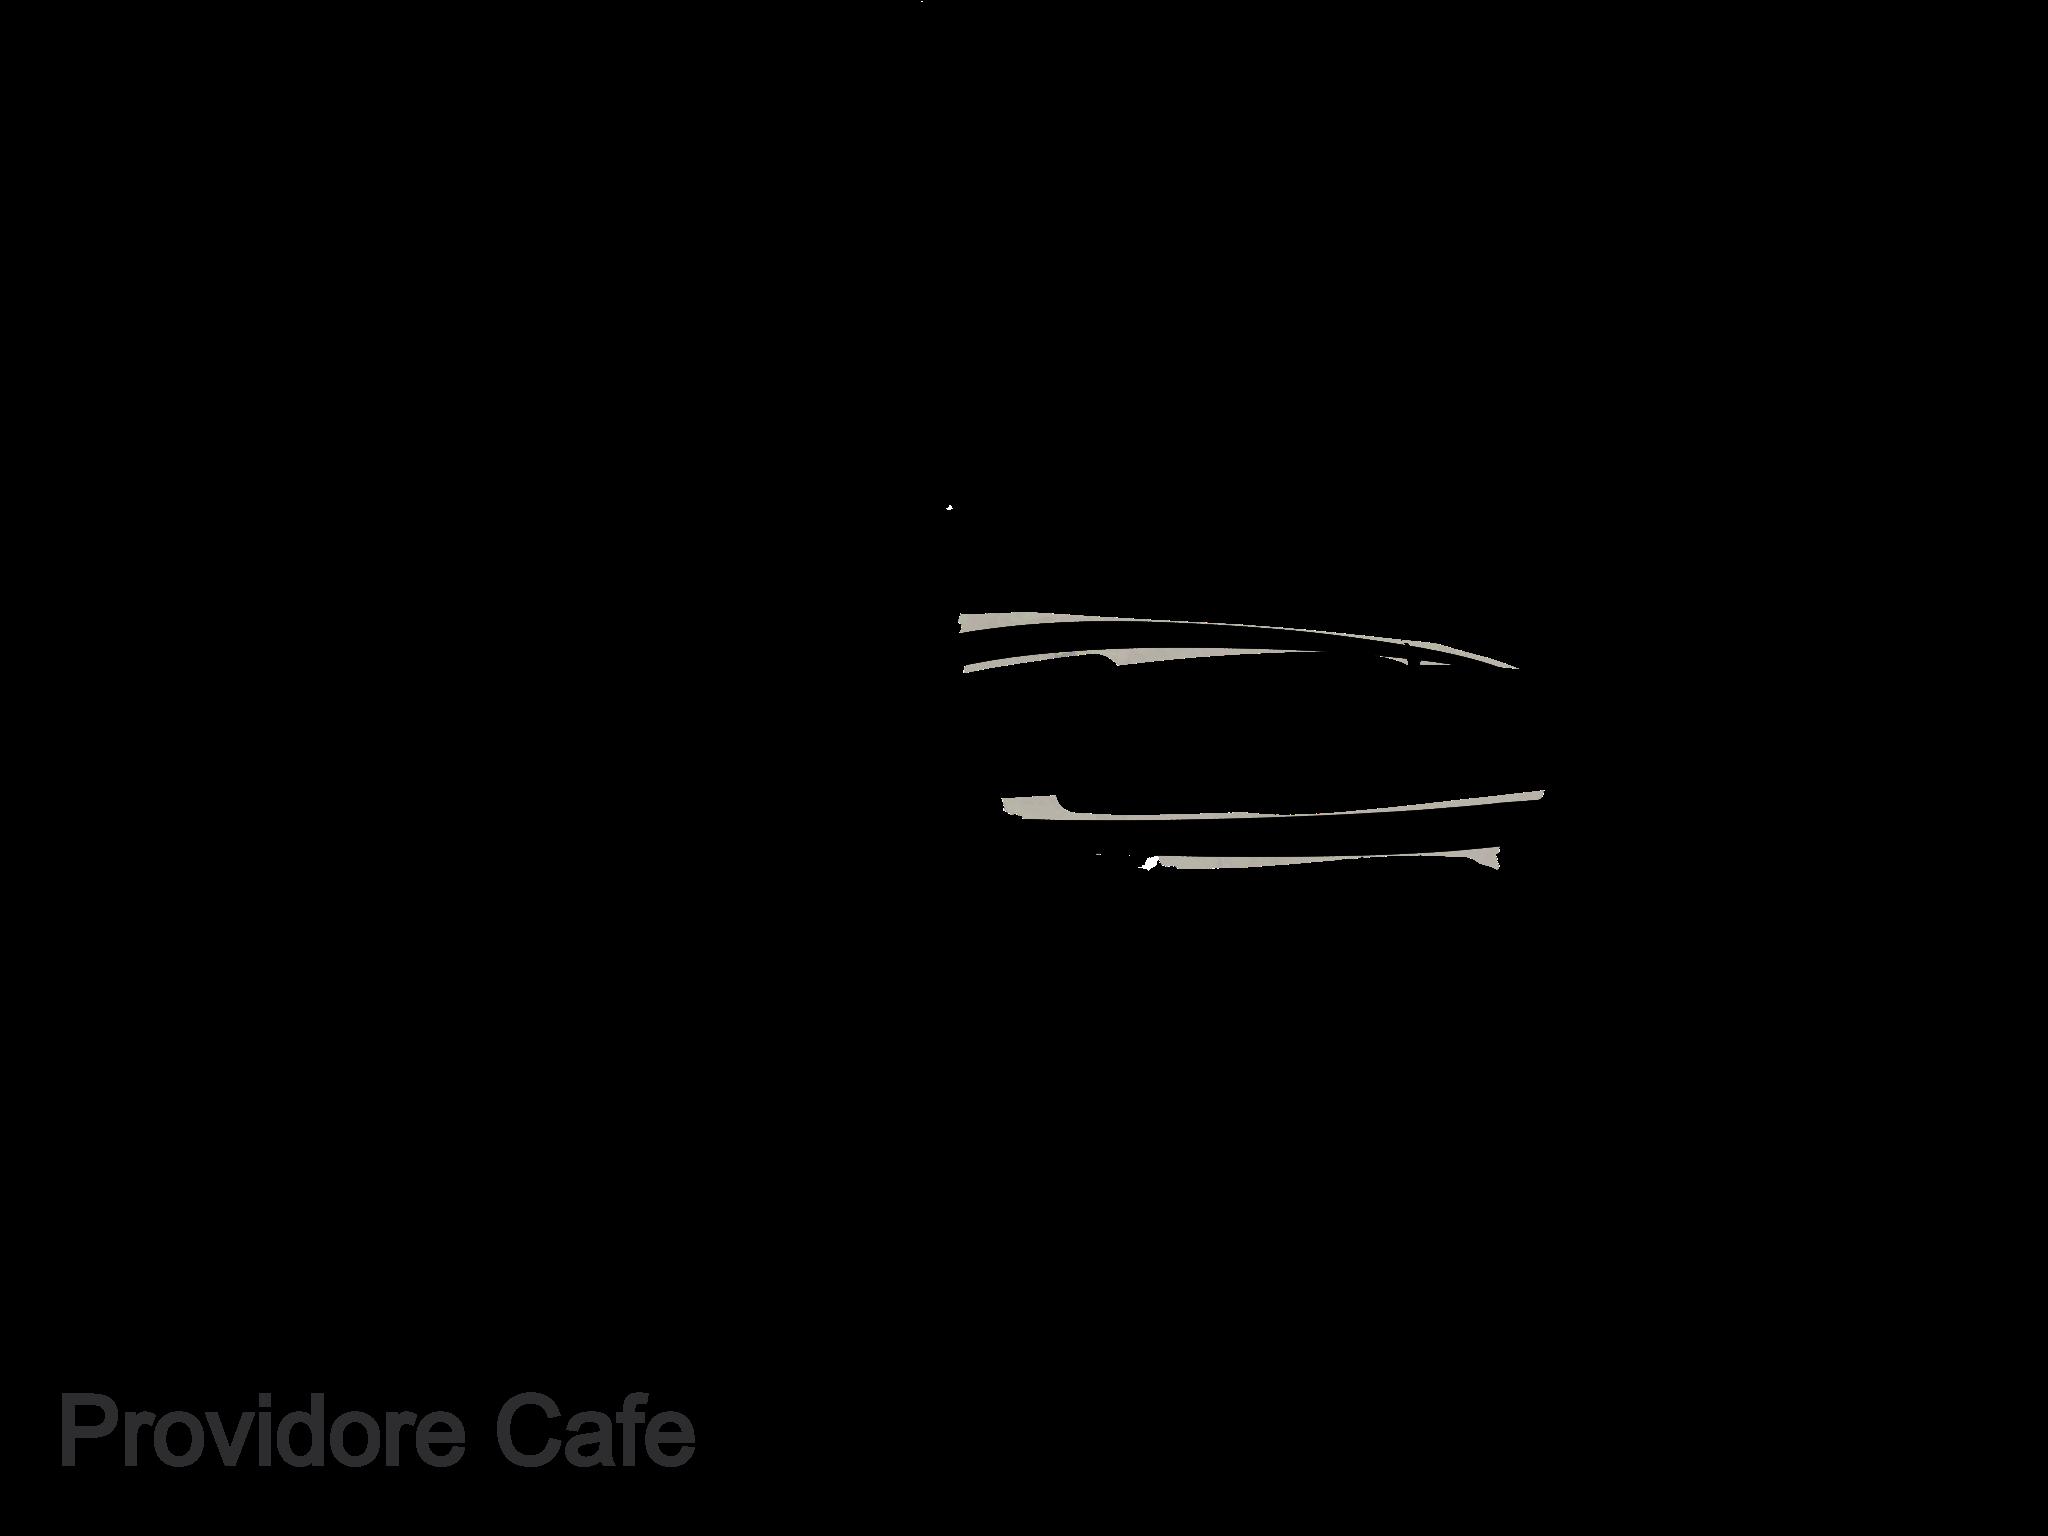 Providore Cafe